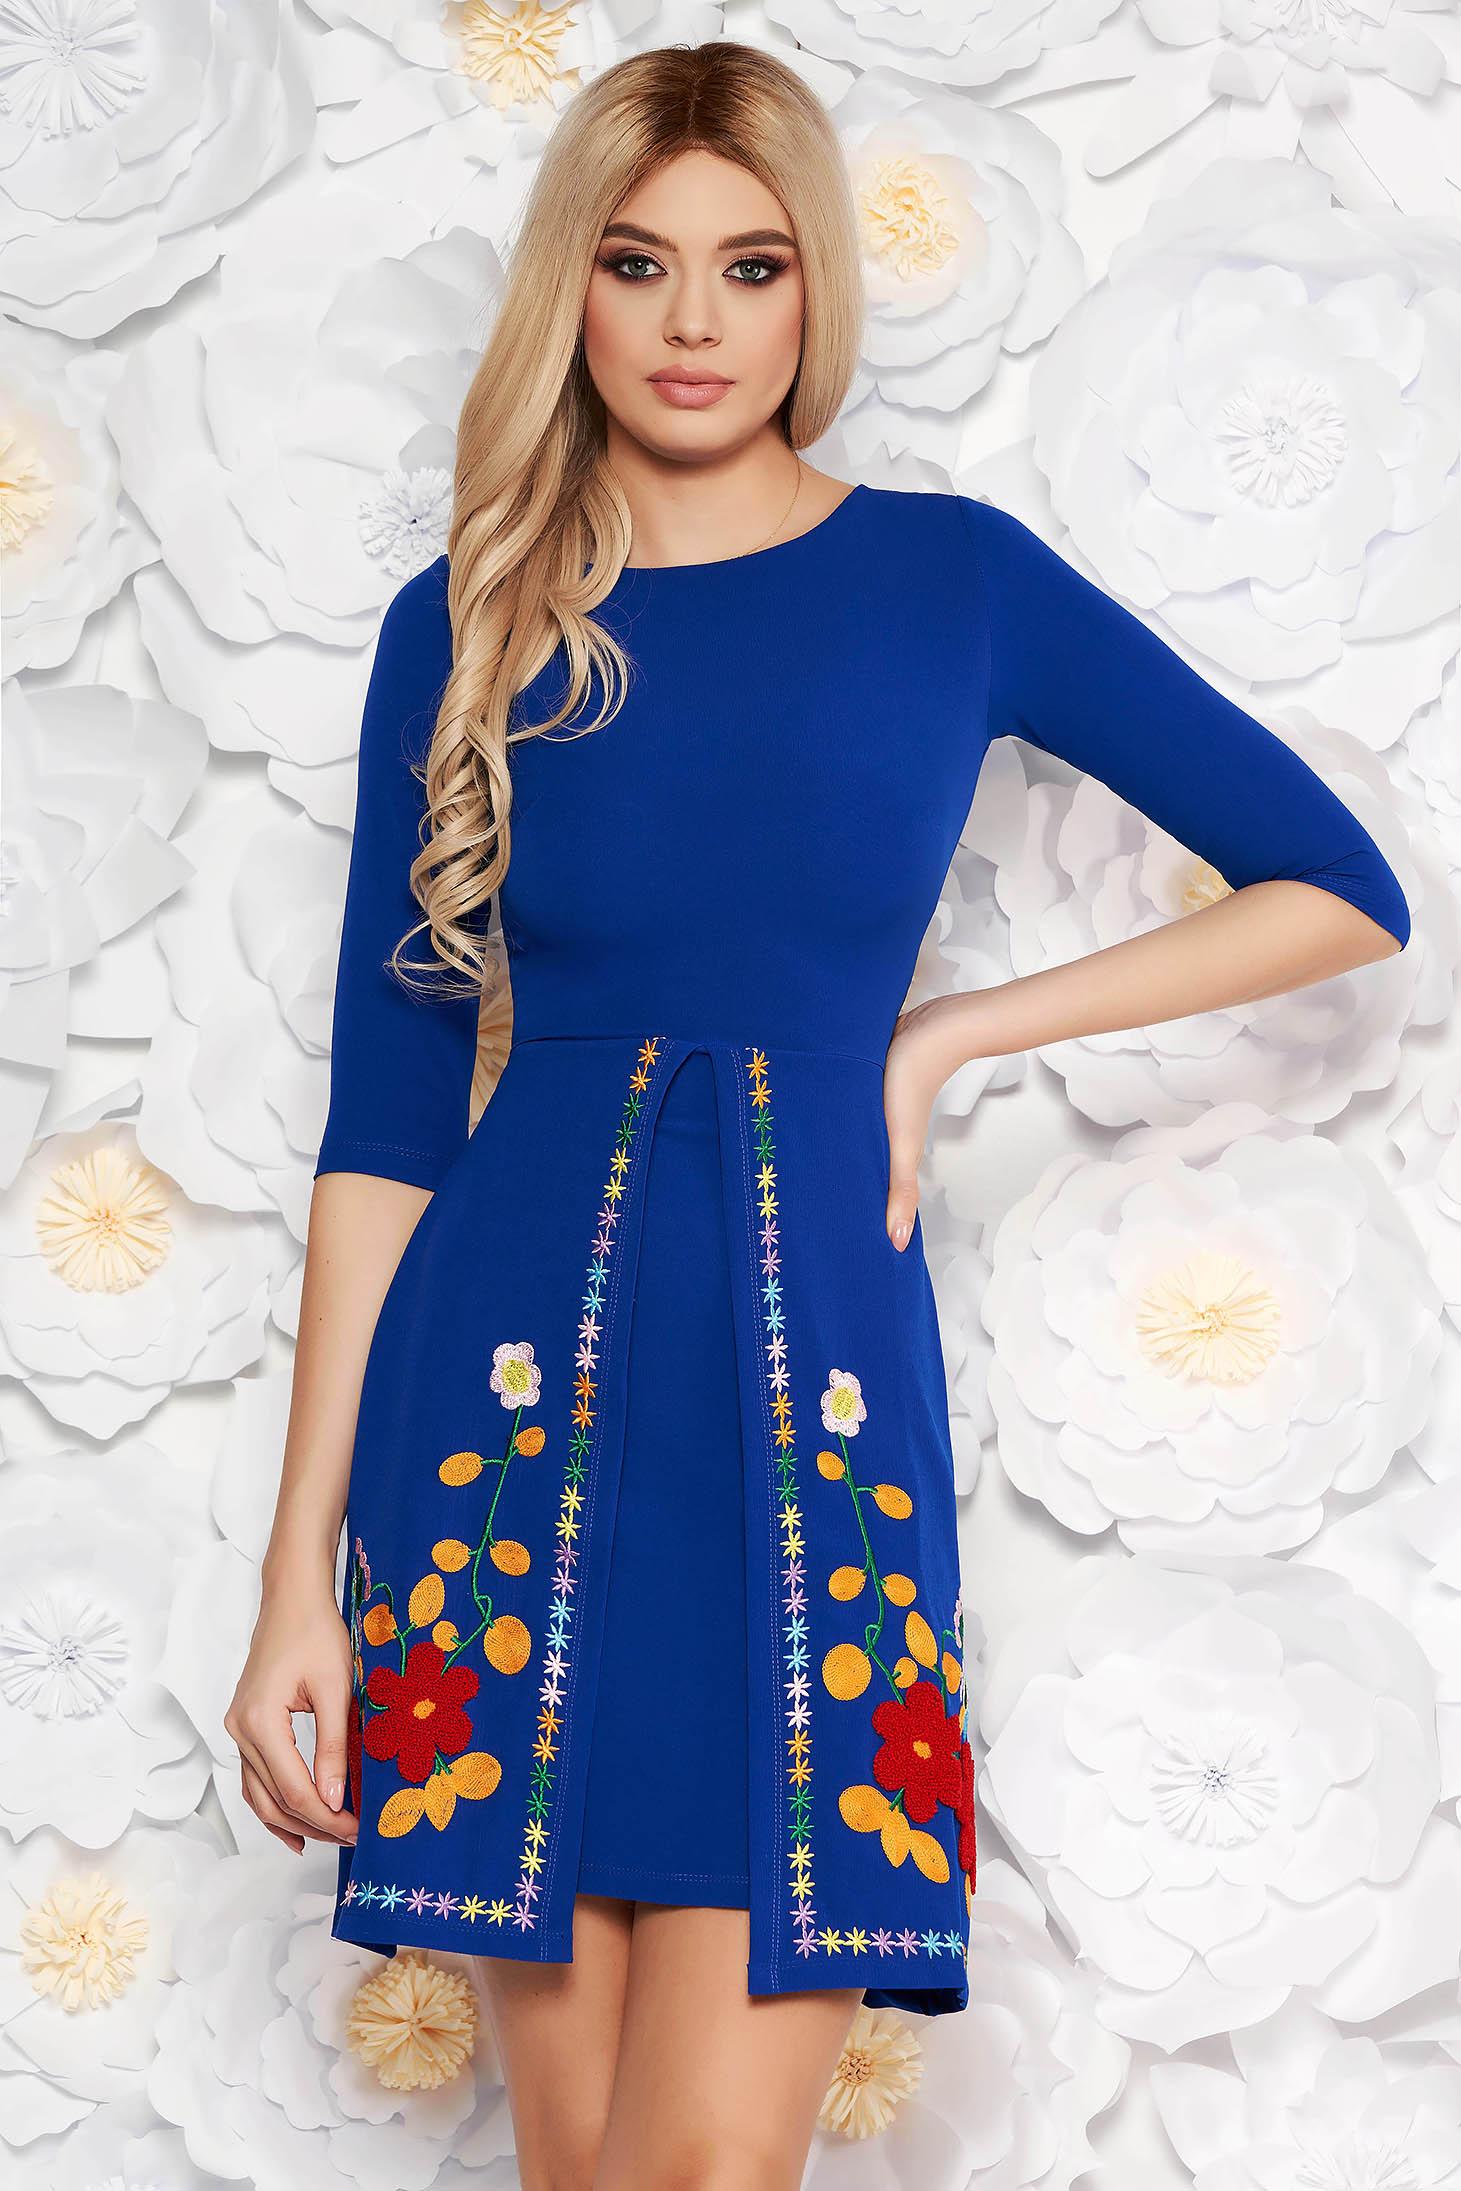 Rochie SunShine albastra scurta de zi in clos cu maneci trei-sferturi din material usor elastic cu insertii de broderie